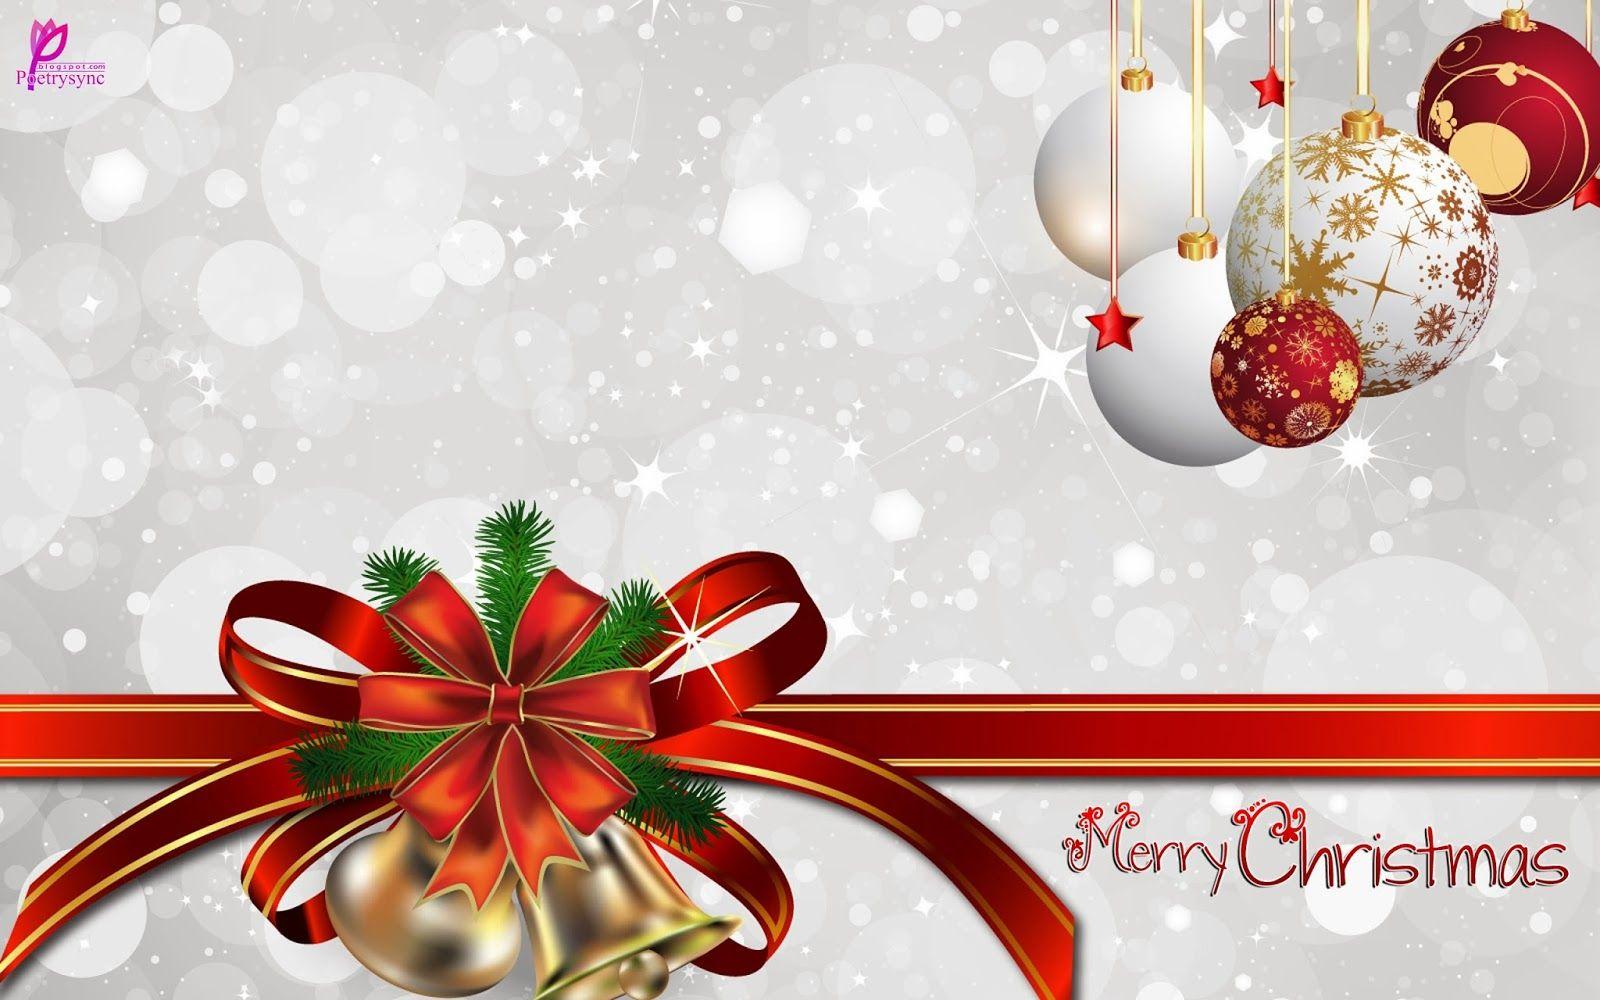 Merry christmas greetings wallpapers christmsas gift ribbon balls 3d merry christmas greetings wallpapers christmsas gift ribbon balls m4hsunfo